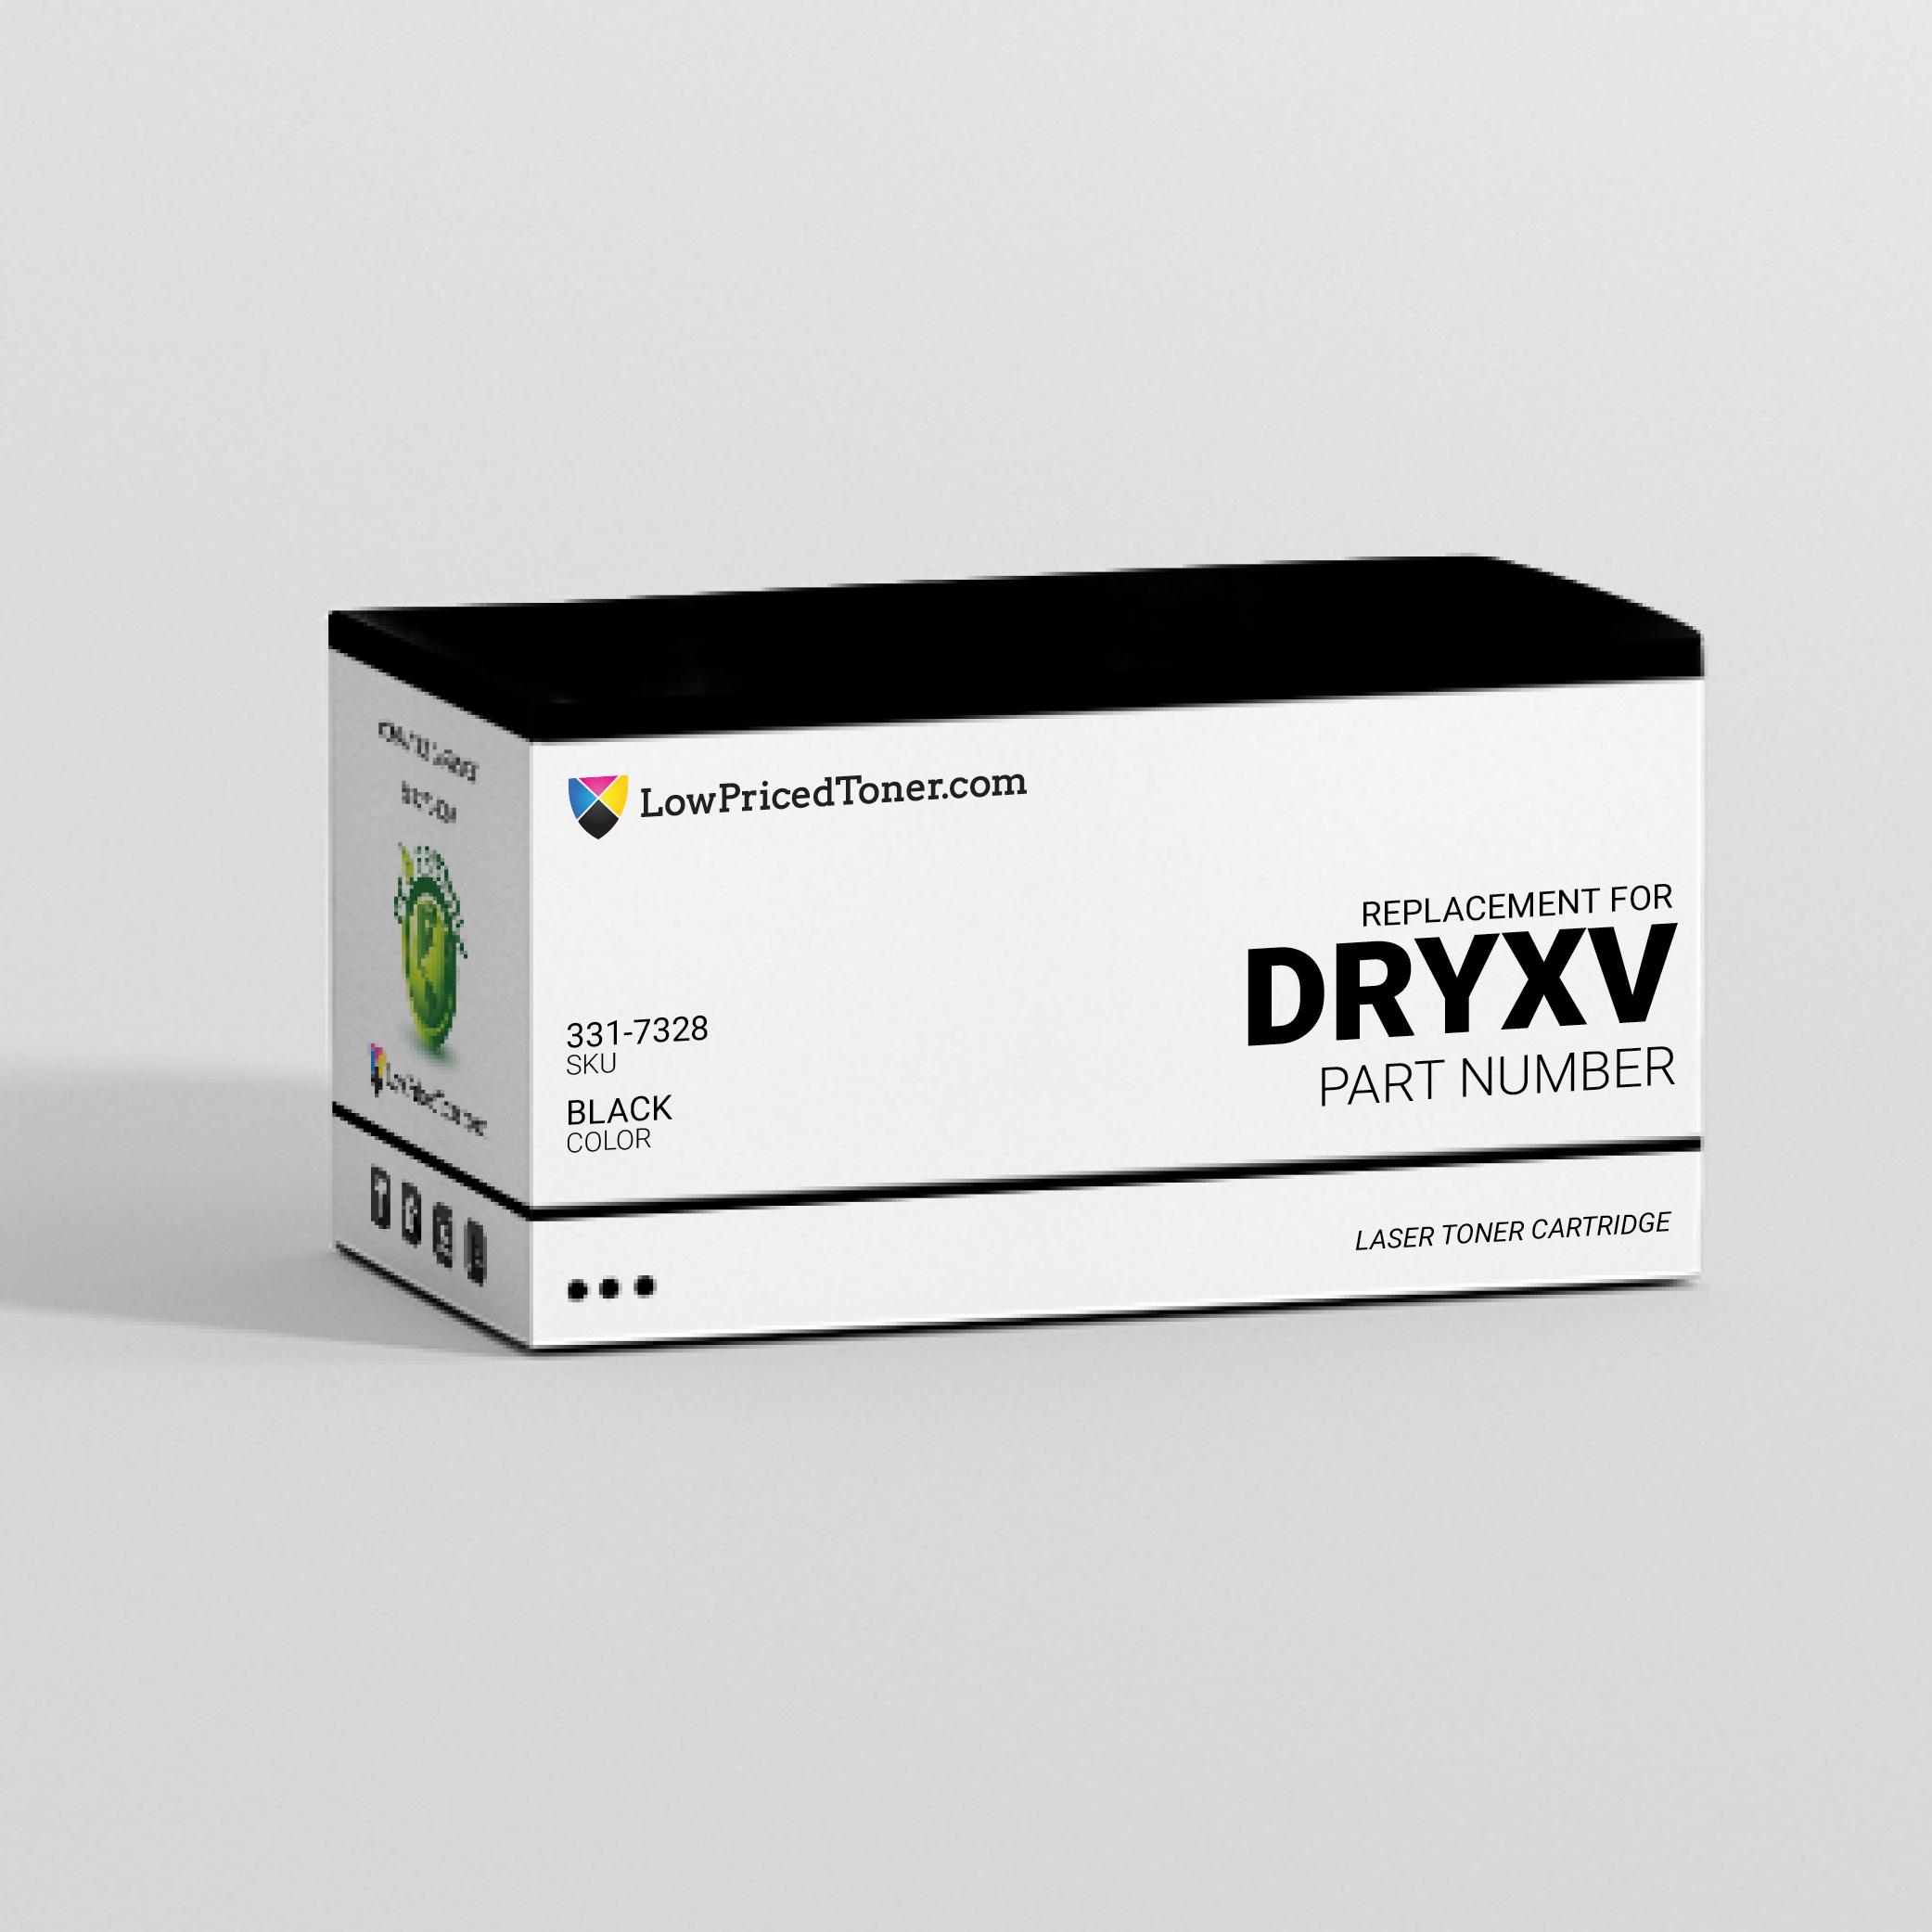 Dell 331-7328 DRYXV Compatible Black Laser Toner Cartridge